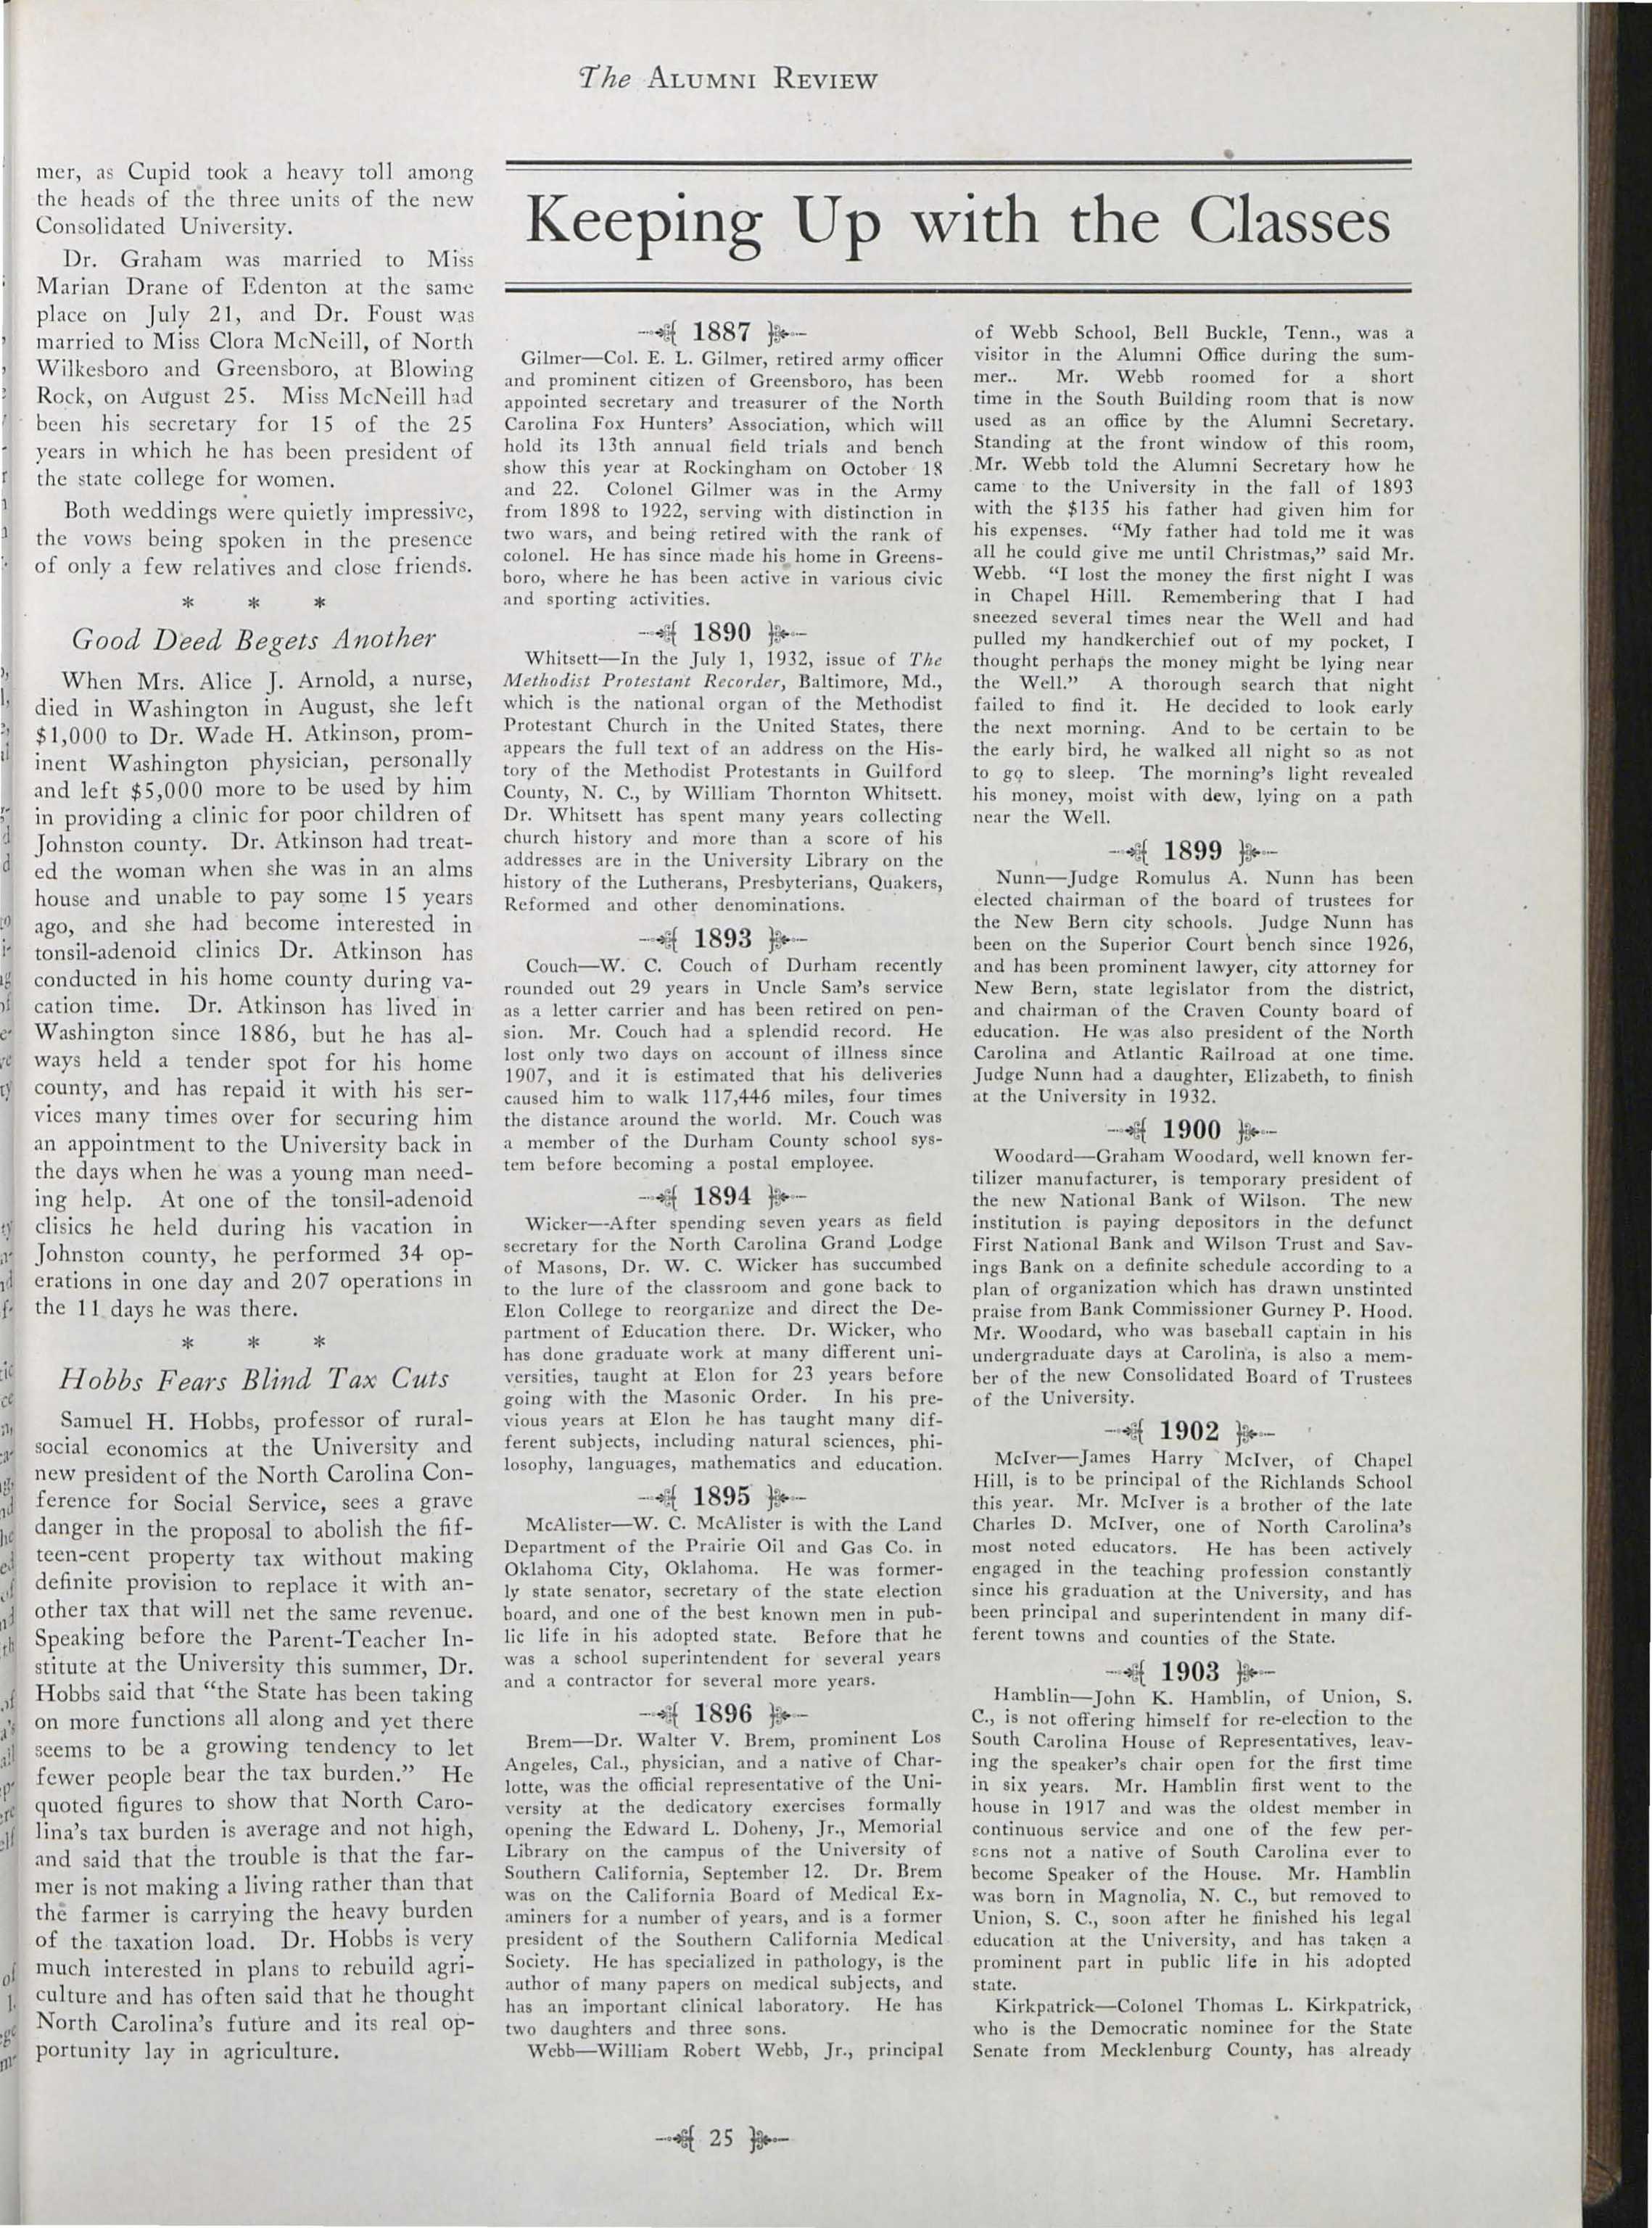 Carolina Alumni Review - October 1932 - page 25